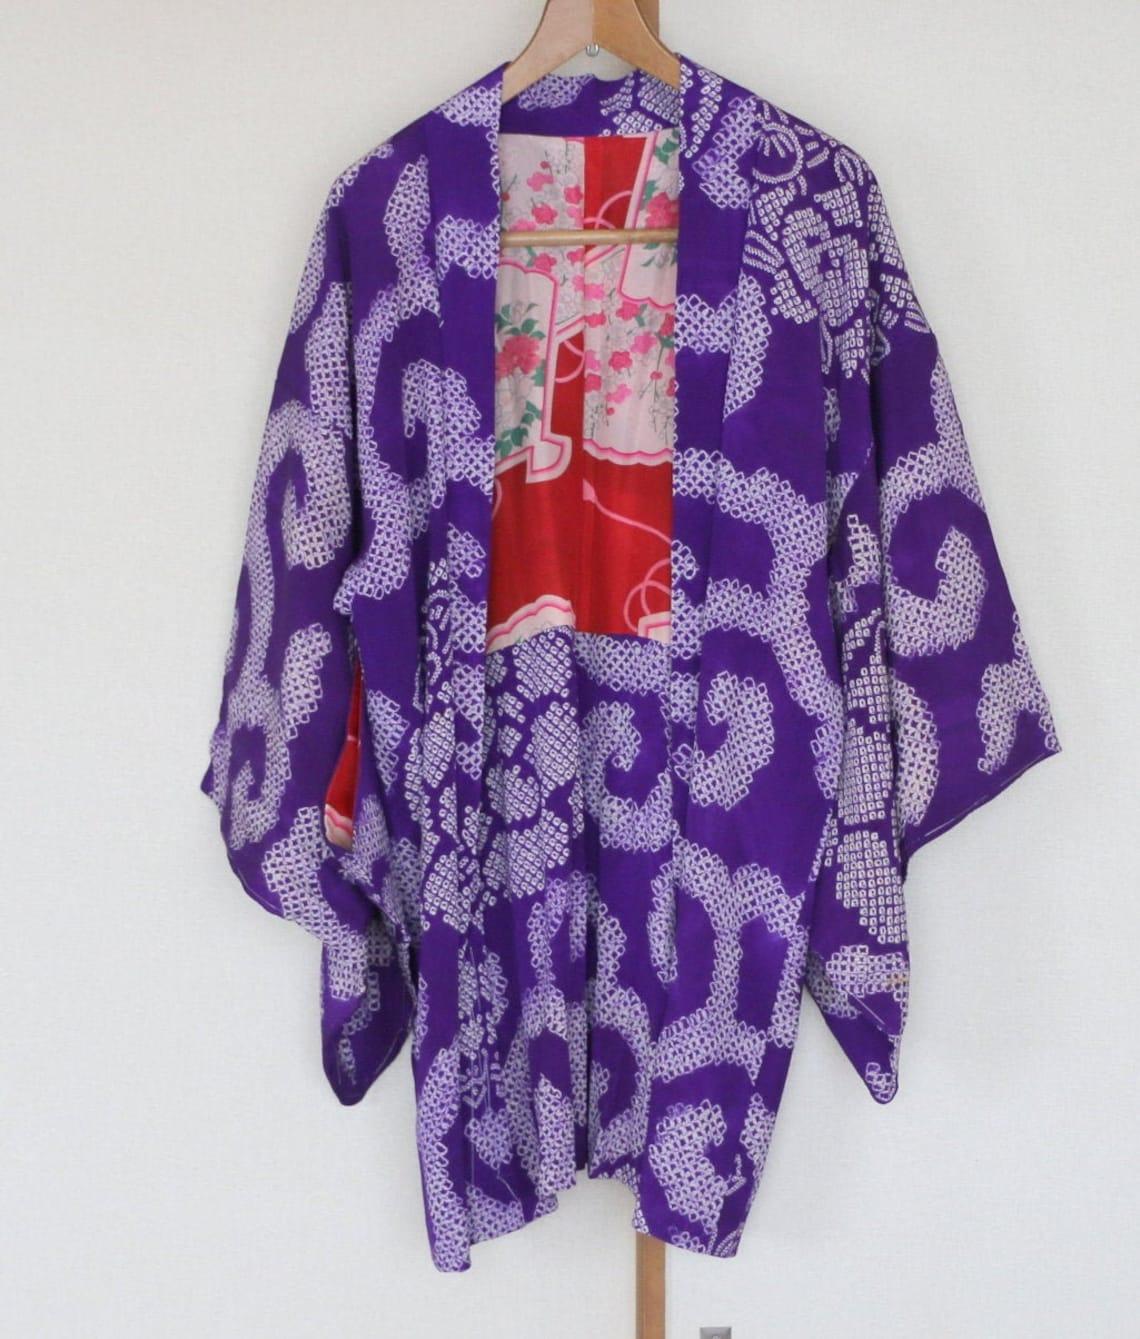 Vintage Japanese Kimono Jacket /// Haori, Silk Shibori Jacke, Jacket, Shibori, Purple Kimono,